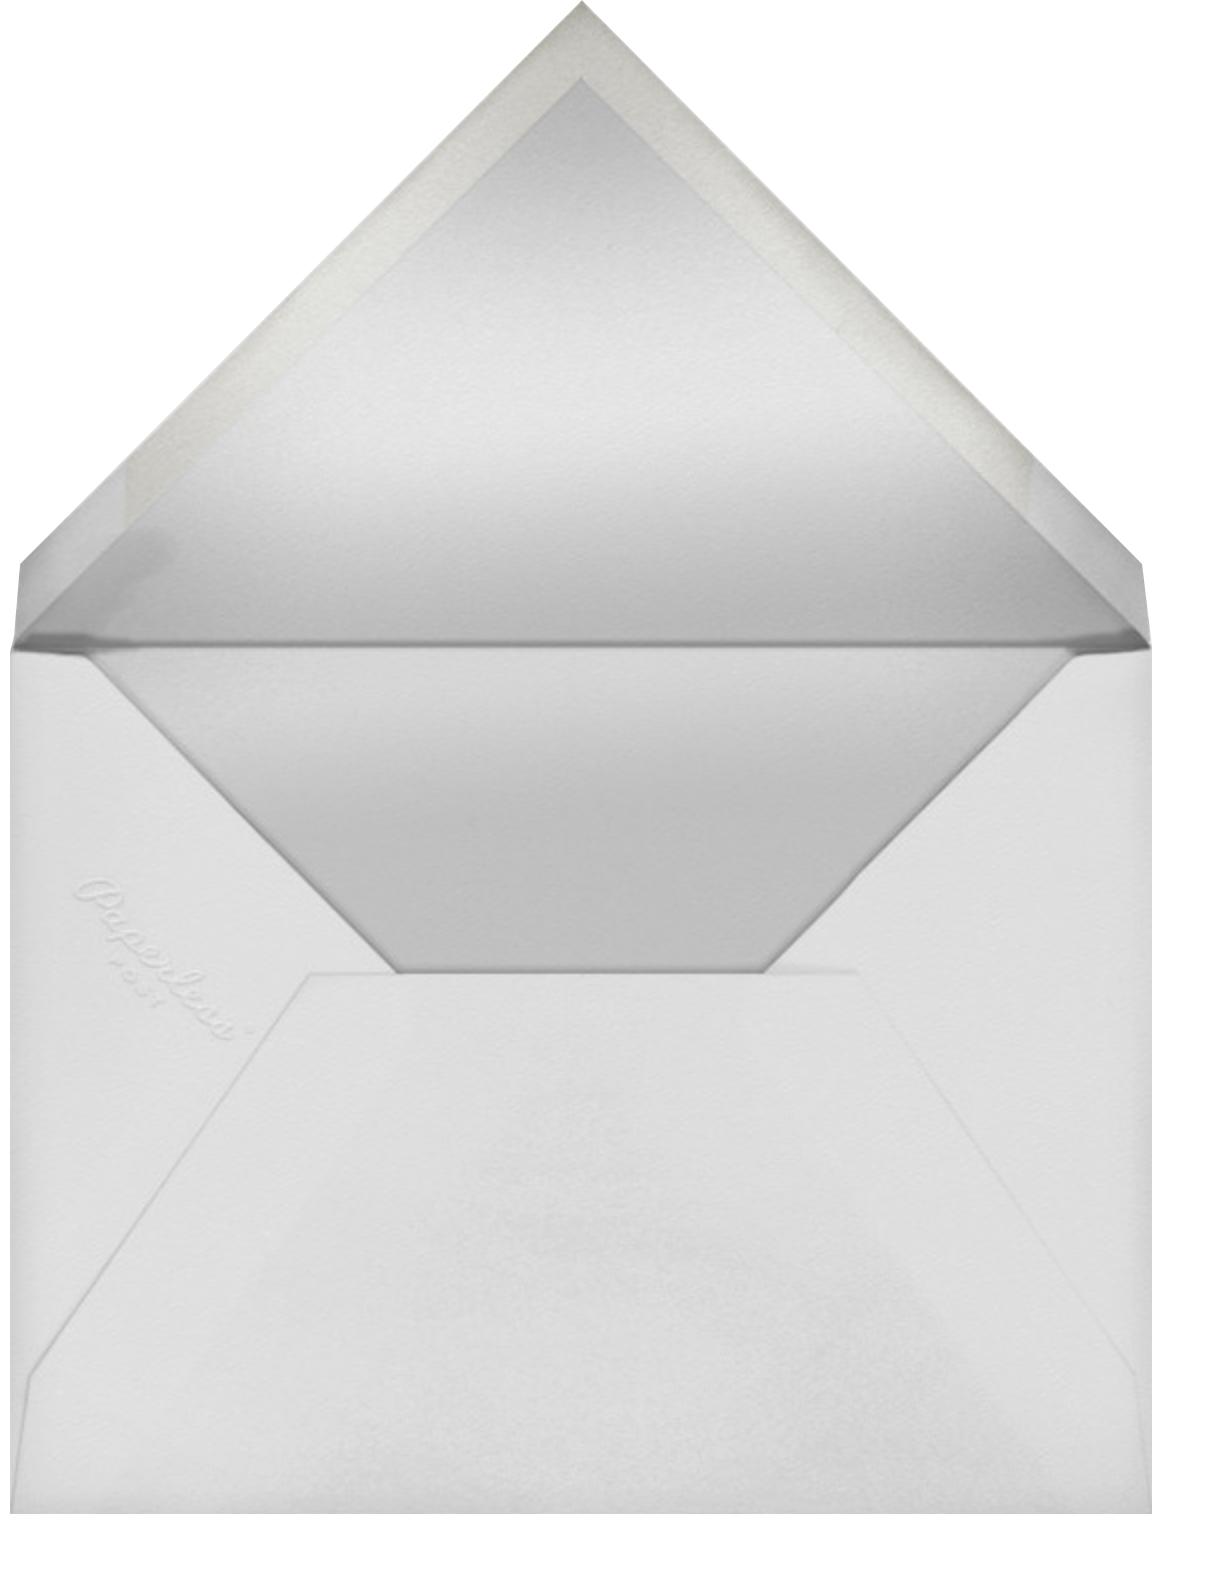 Talk of the Flock - Paperless Post - Baby shower - envelope back